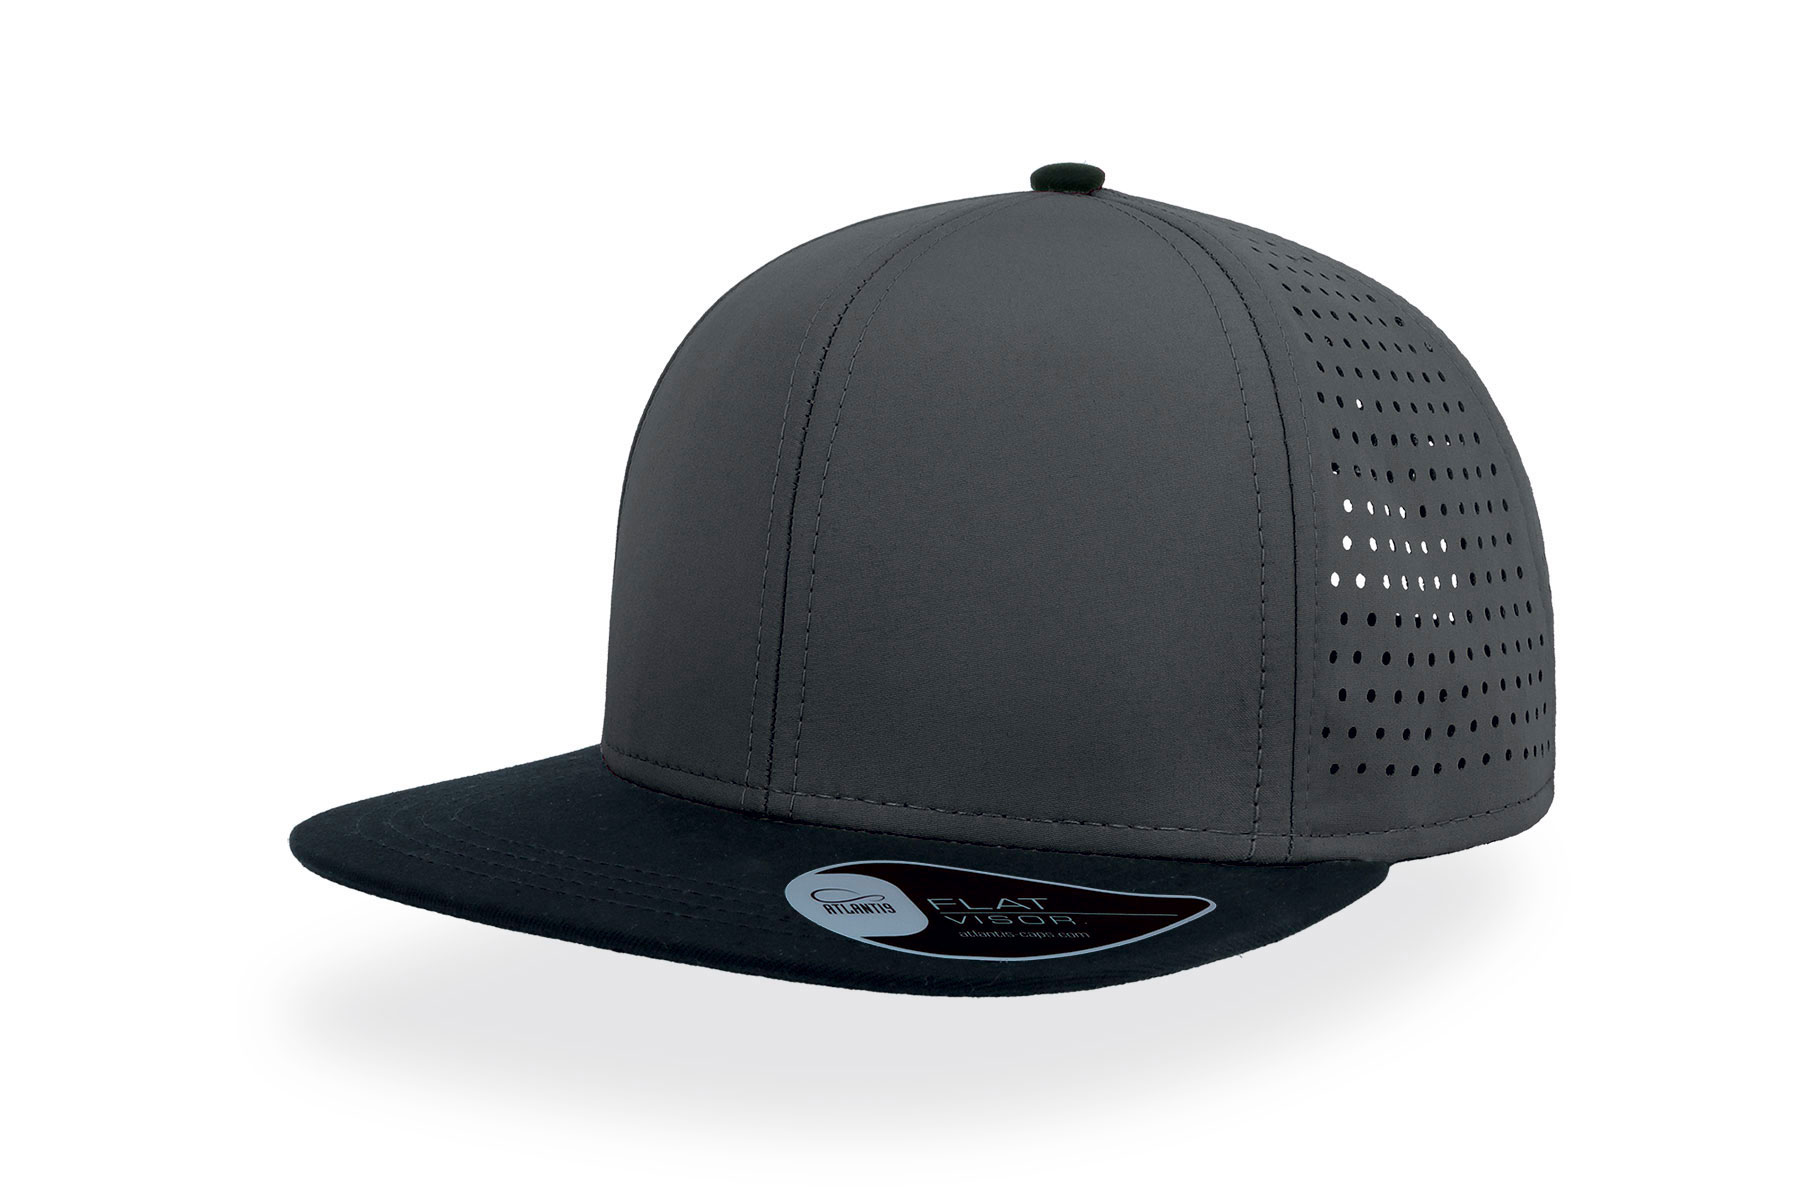 Bank suoralippa - NEW 2019 ATLANTIS CAPS & HATS - BANK - 2